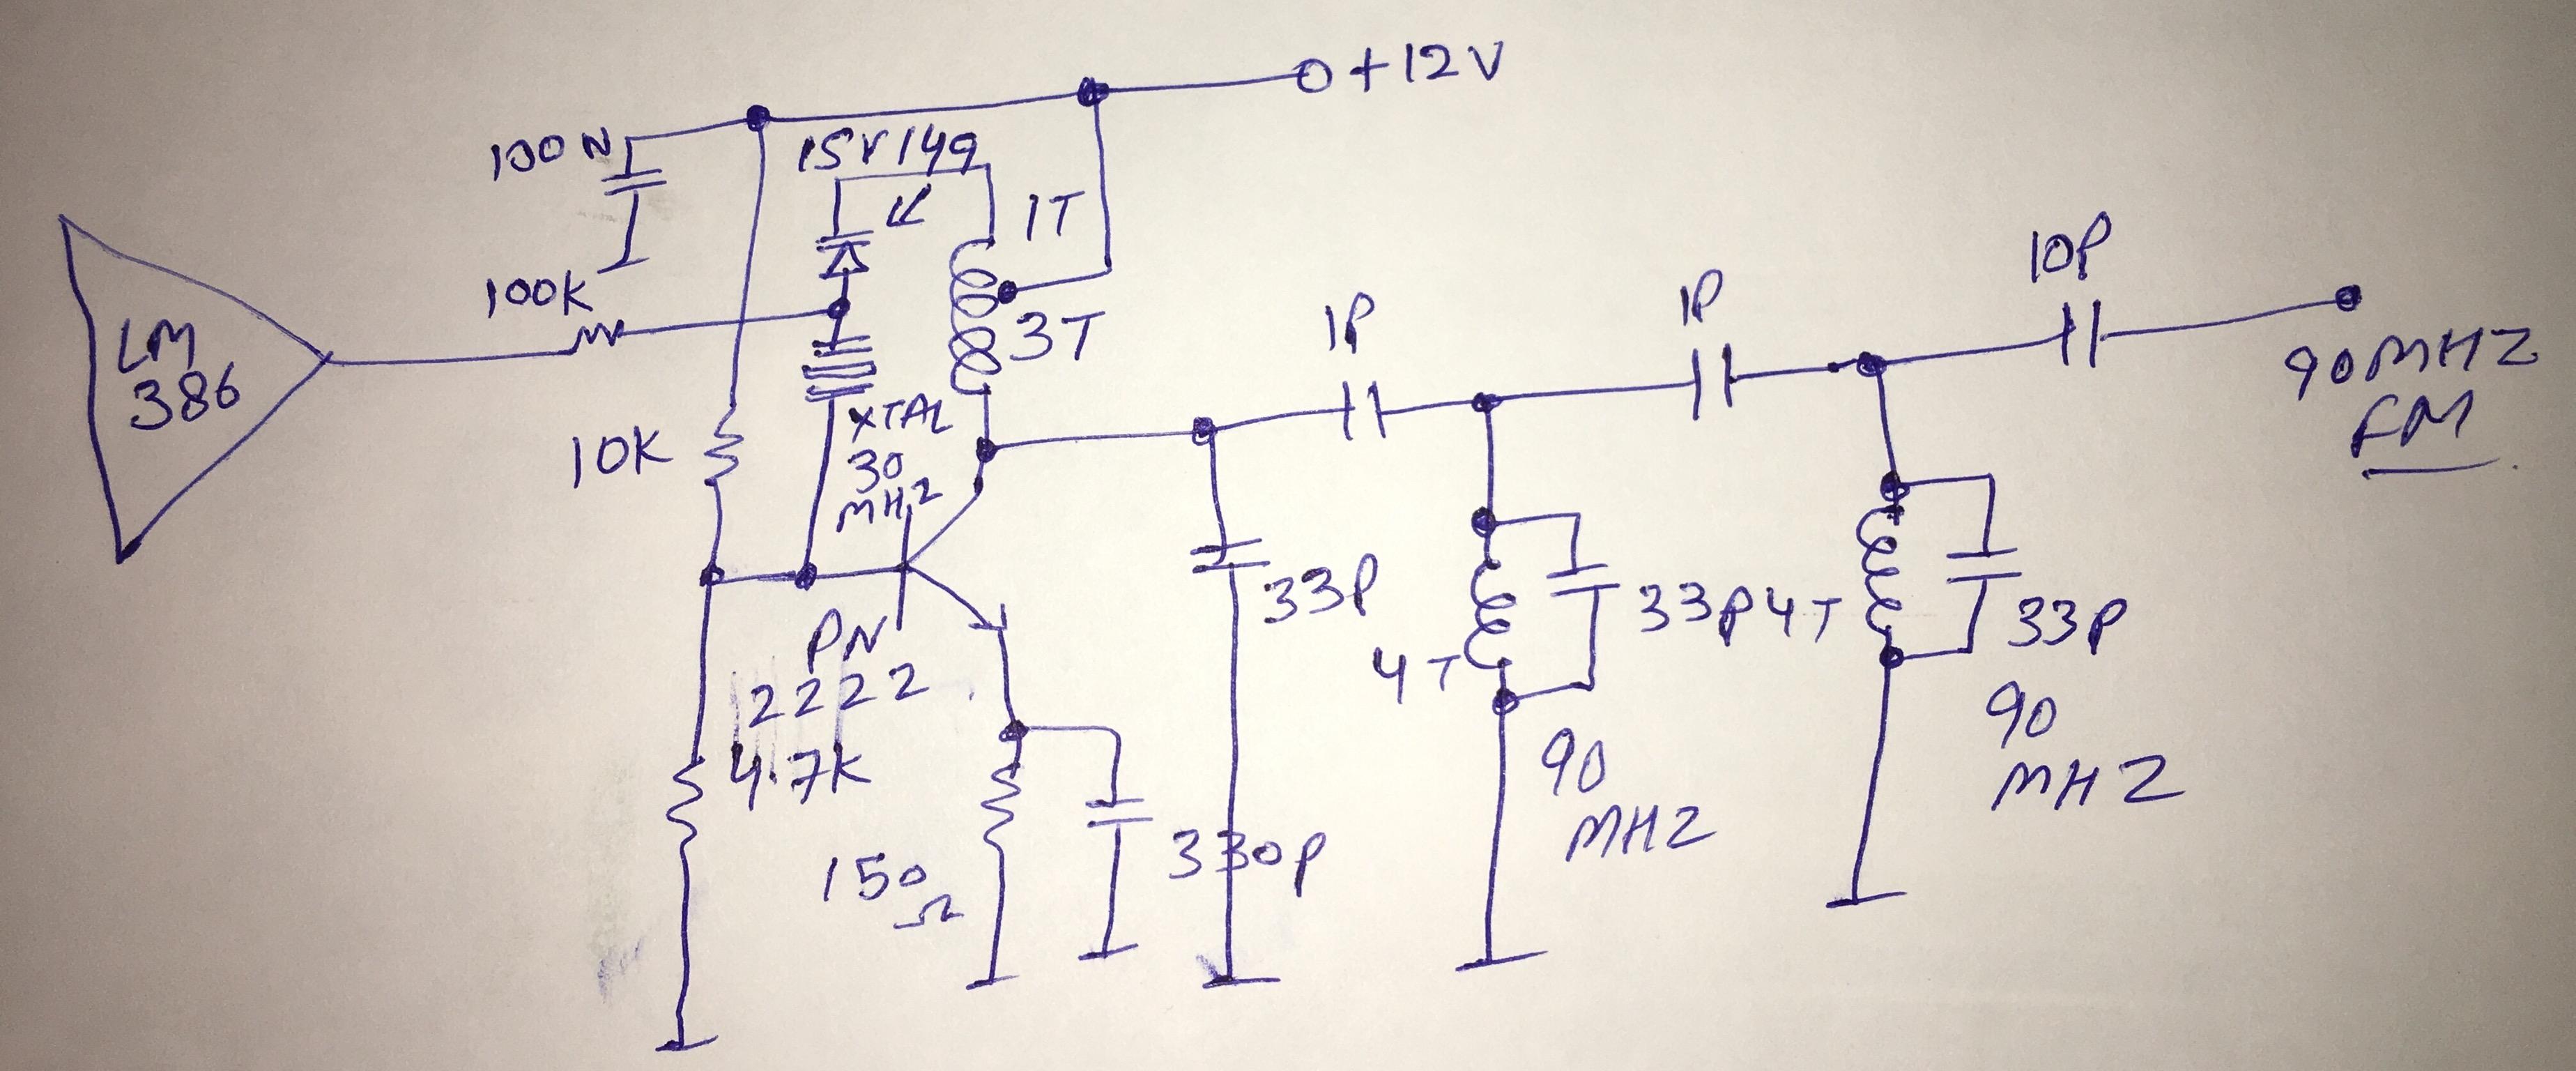 10 mW NBFM Transmitter Schematic  1f8fe610